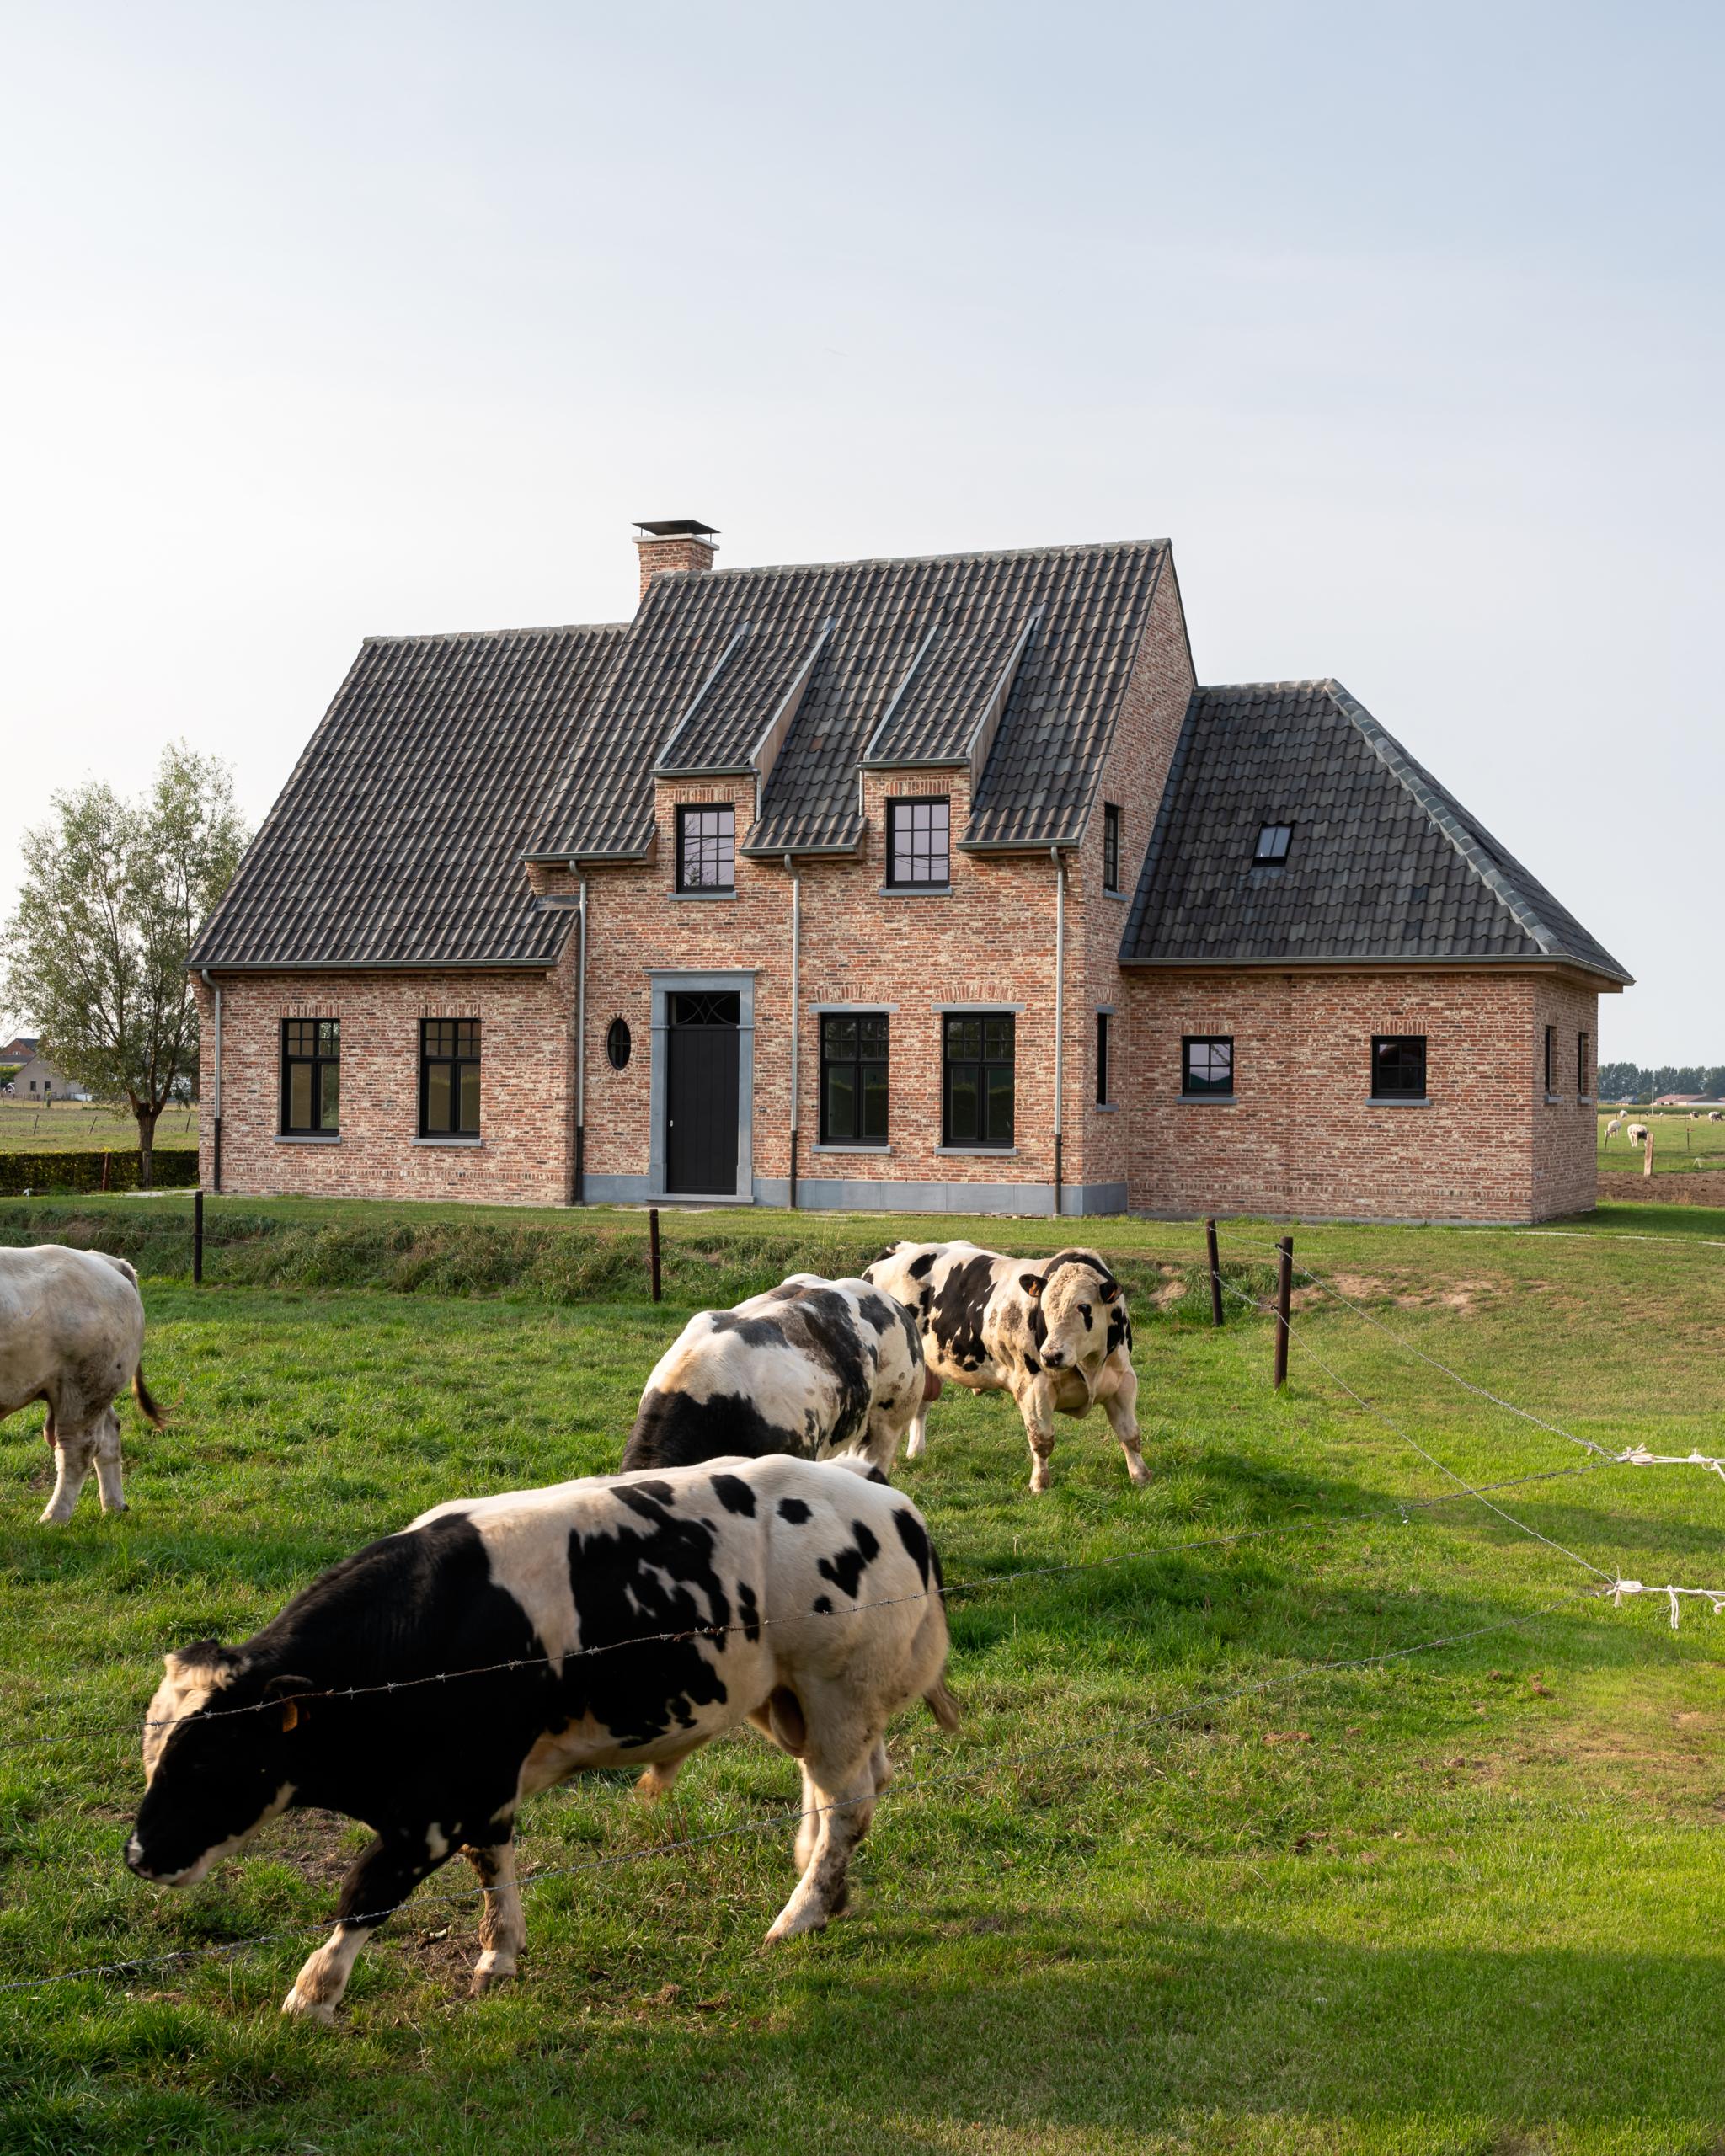 A rural house landelijke woning E Waterland Oudeman (7)